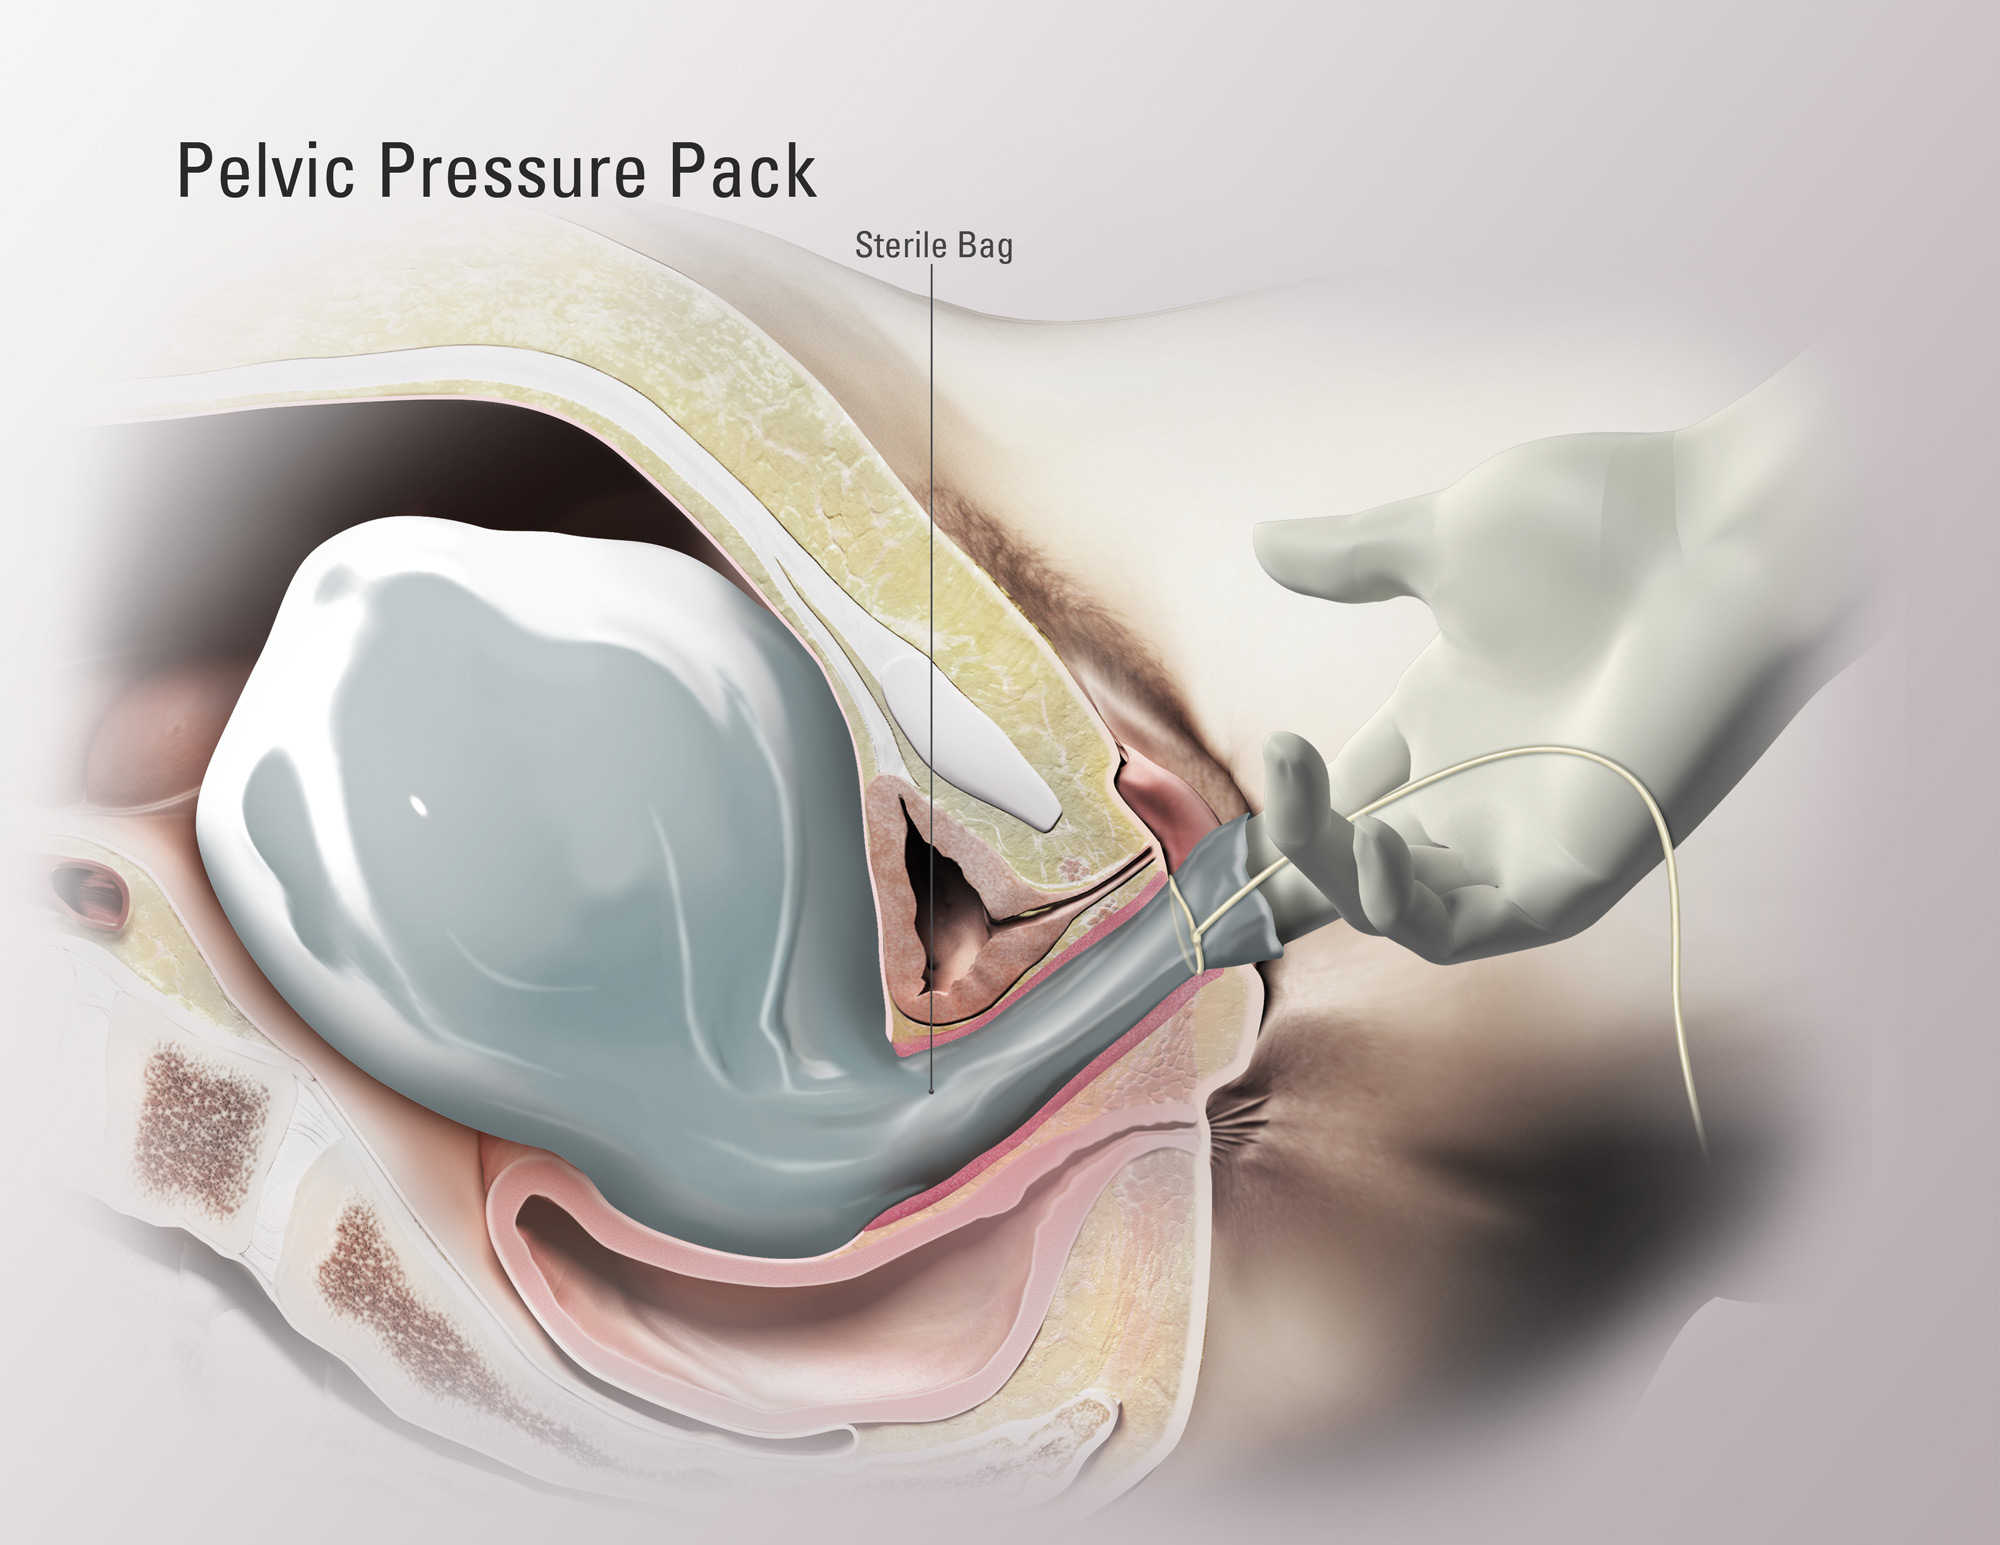 Pelvic Pressure Pack